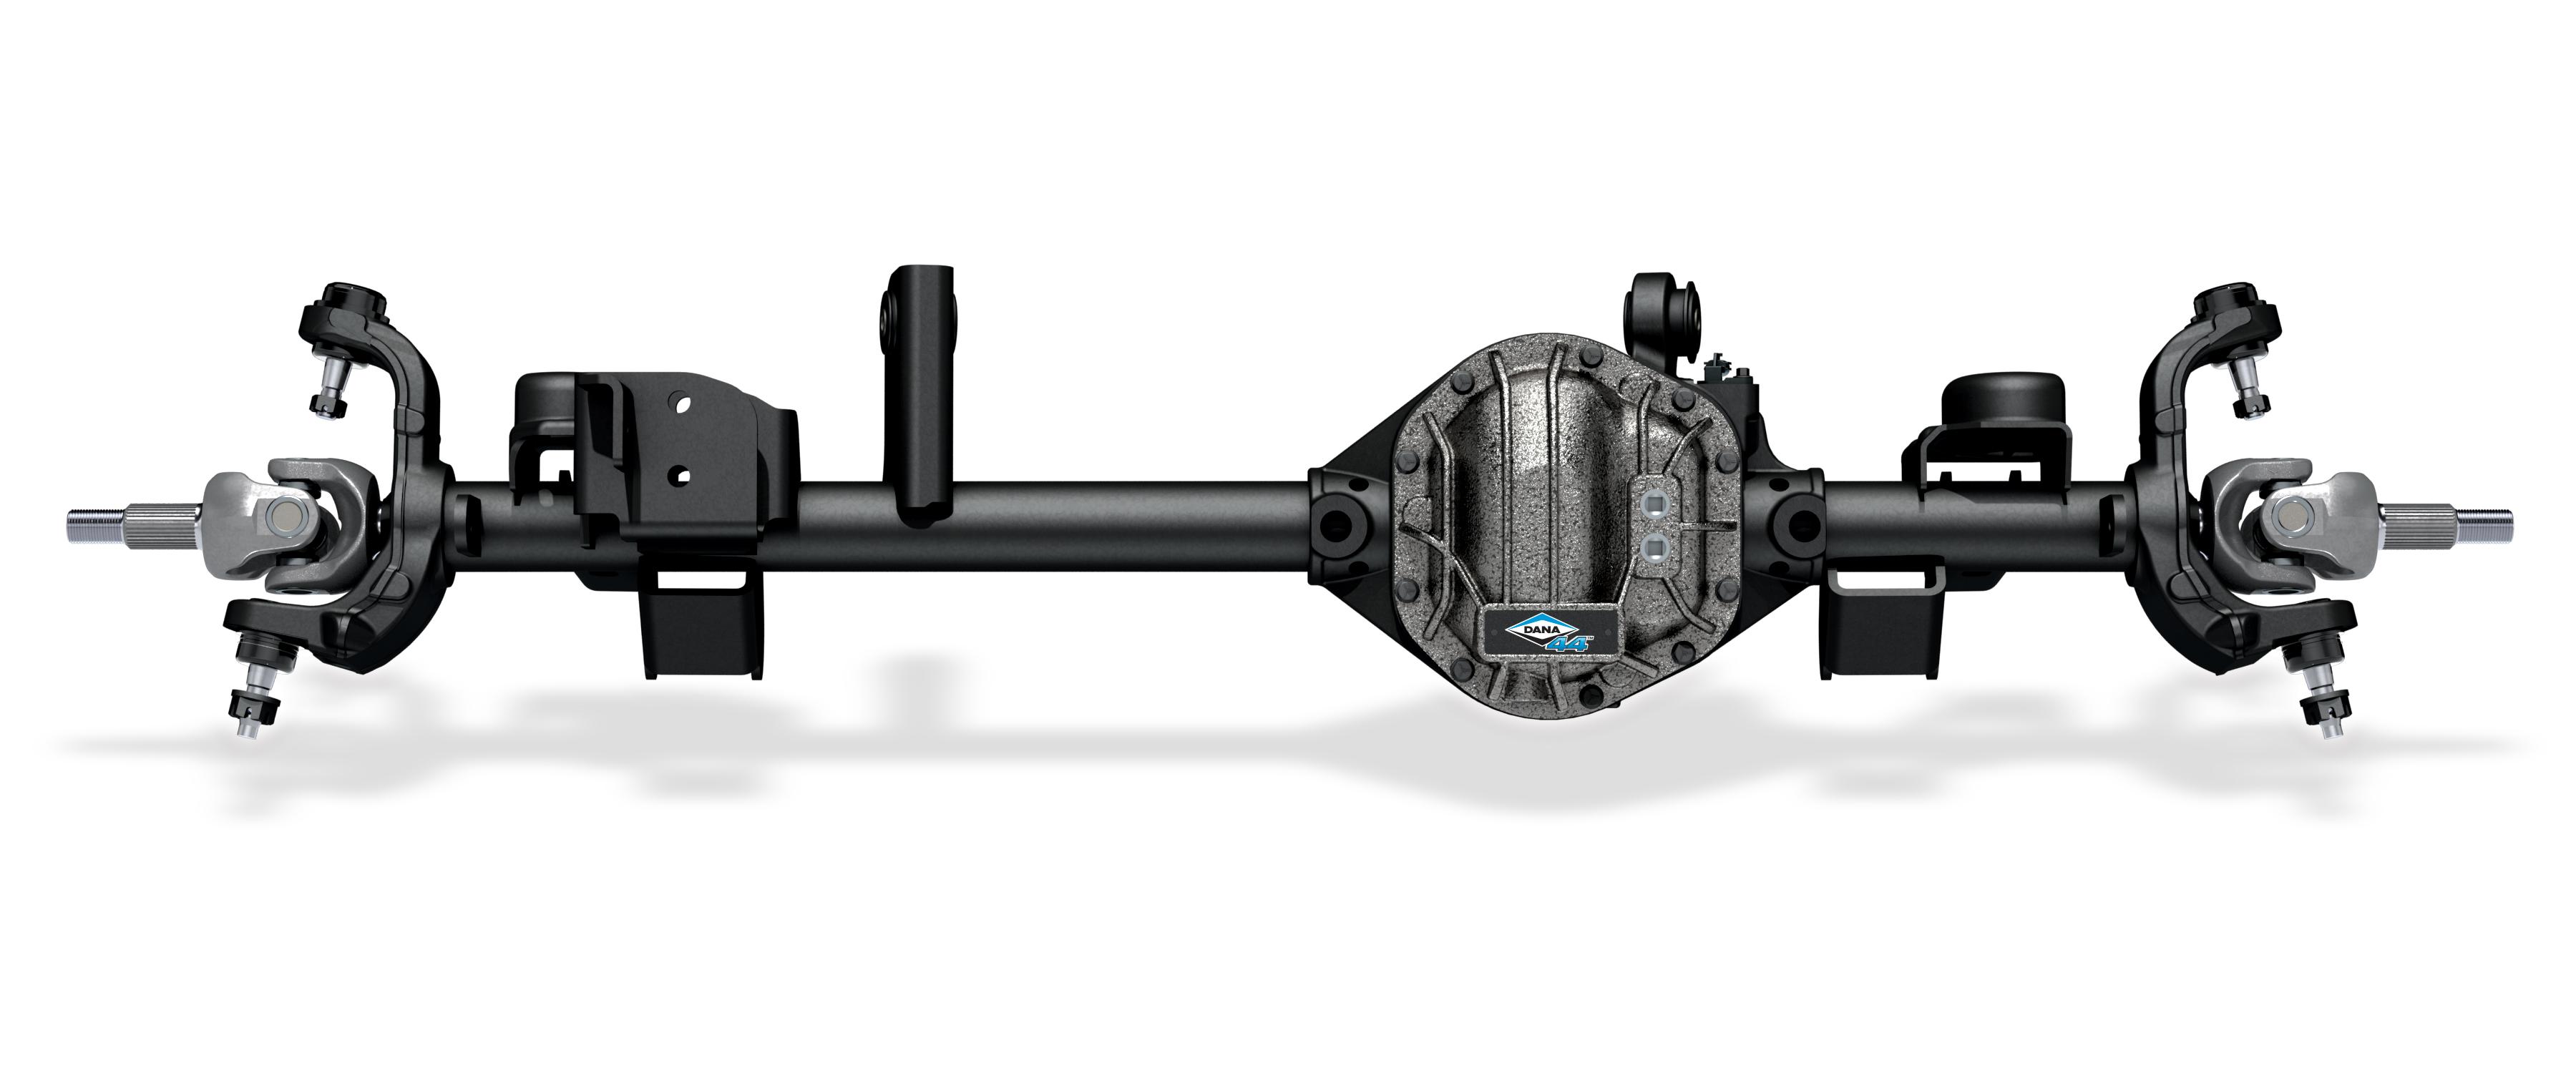 dana 80 rear axle diagram 1997 mitsubishi mirage radio wiring ultimate 44 front axles spicer parts